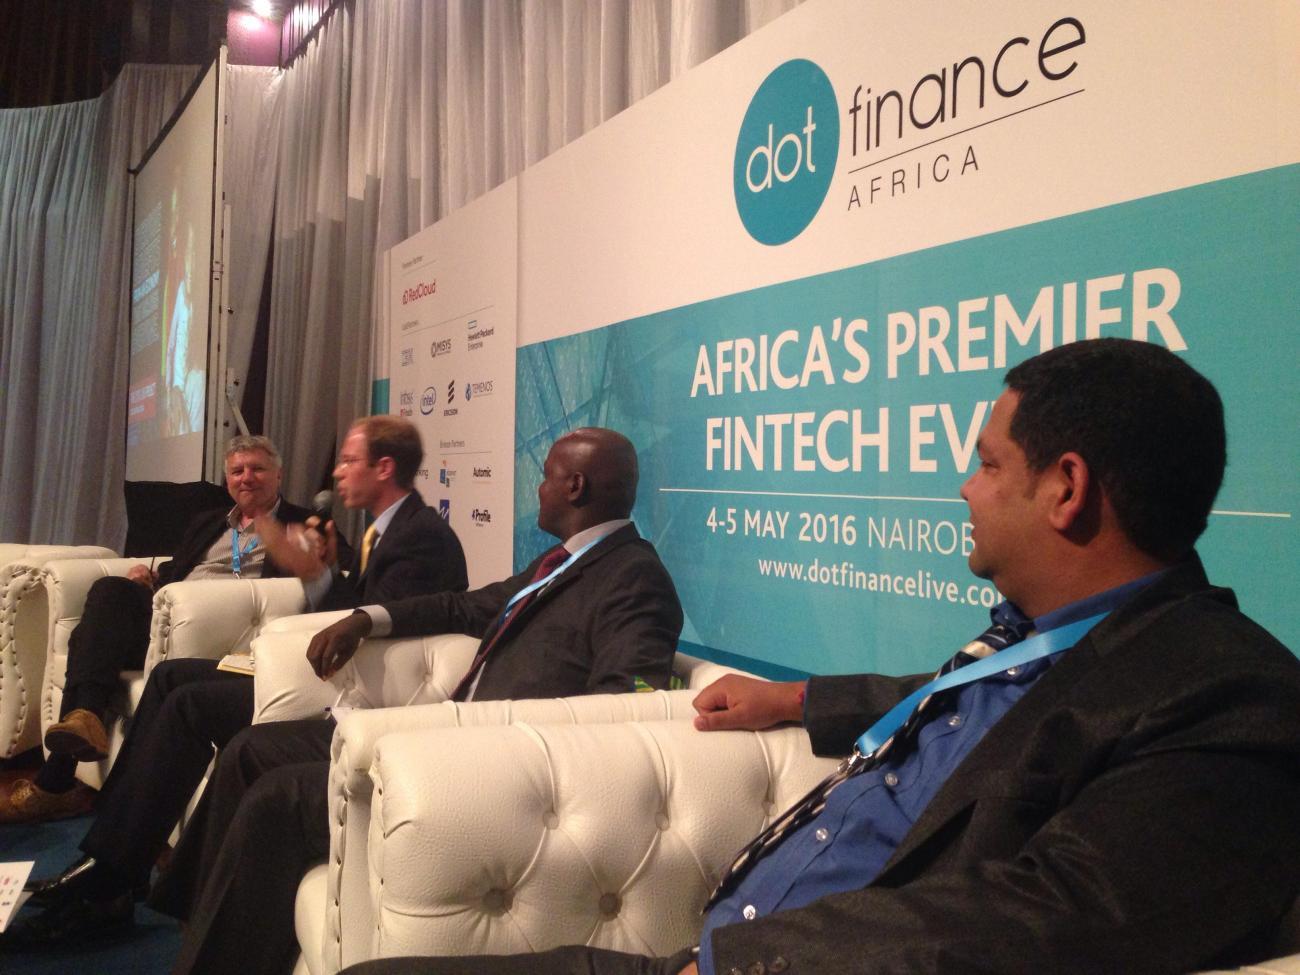 Dot Finance Africa